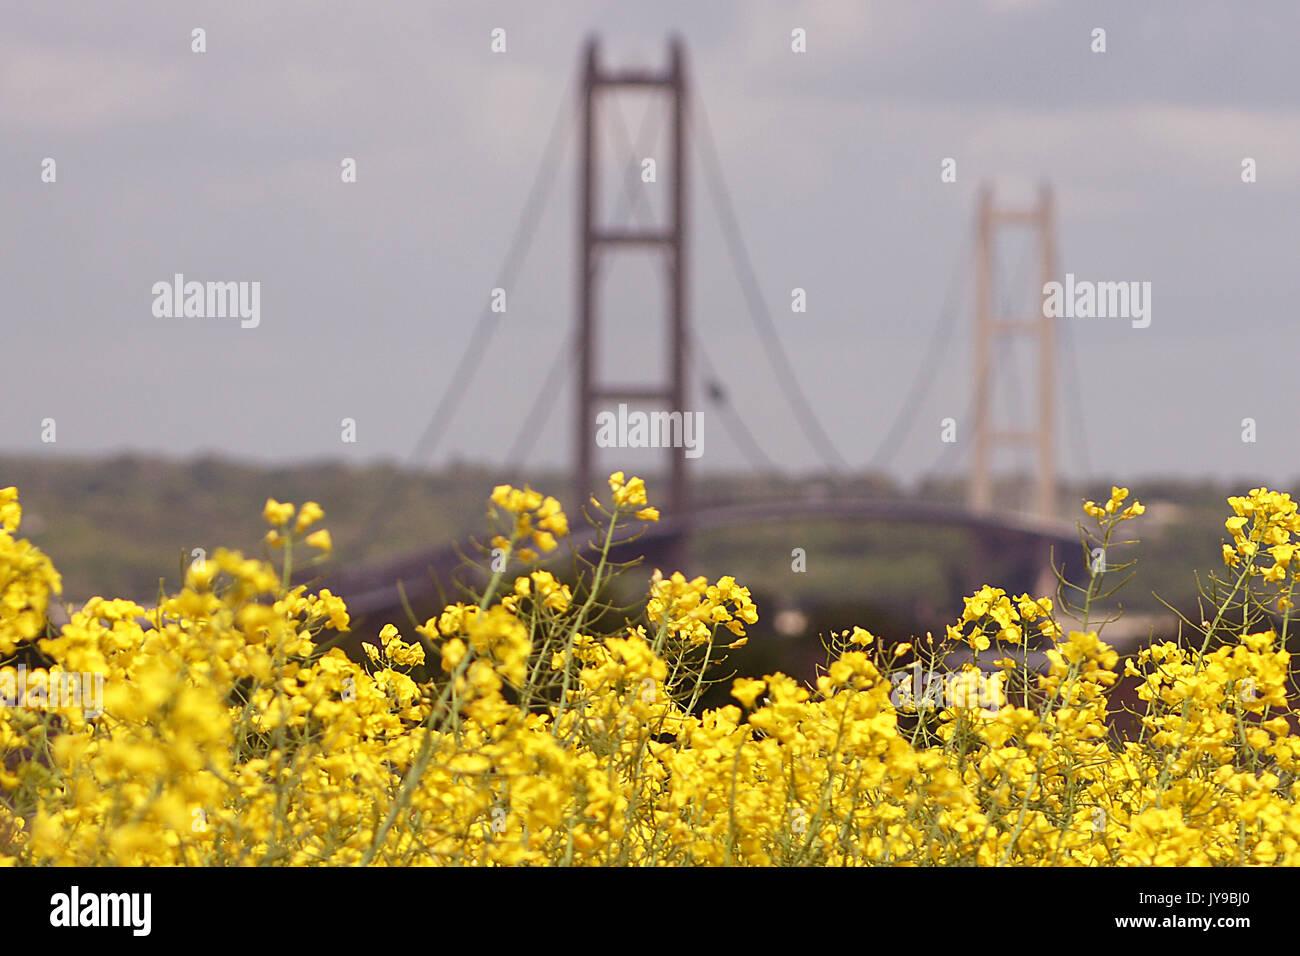 Humber Bridge, barton upon Humber - Stock Image